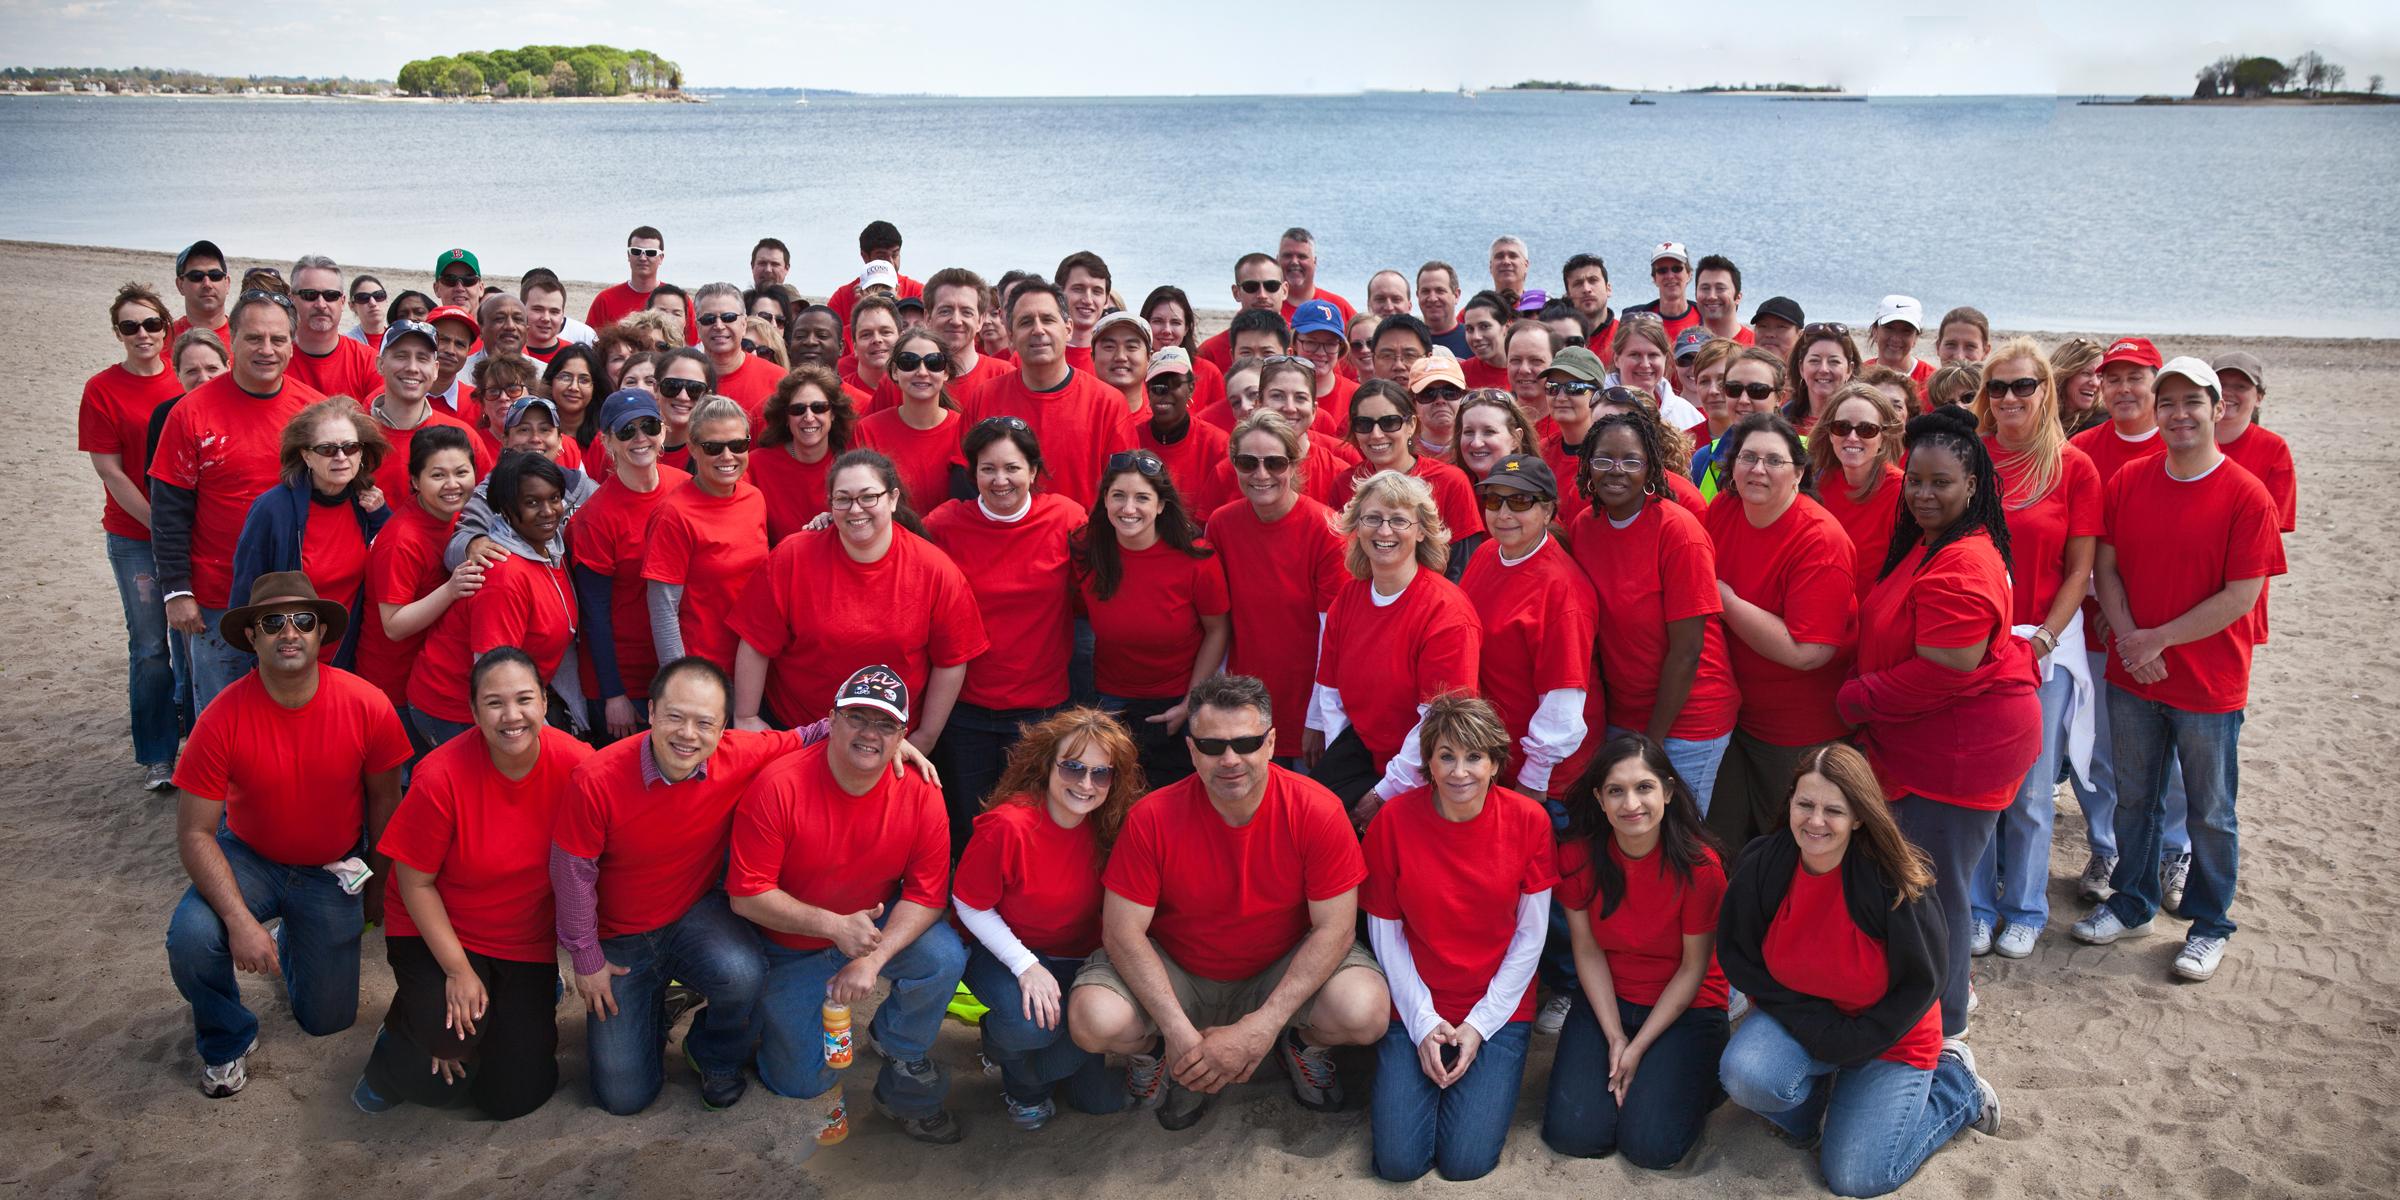 Pepperidge Farm Employees Get Norwalk Beaches Ready For Busy Summer Season Business Wire